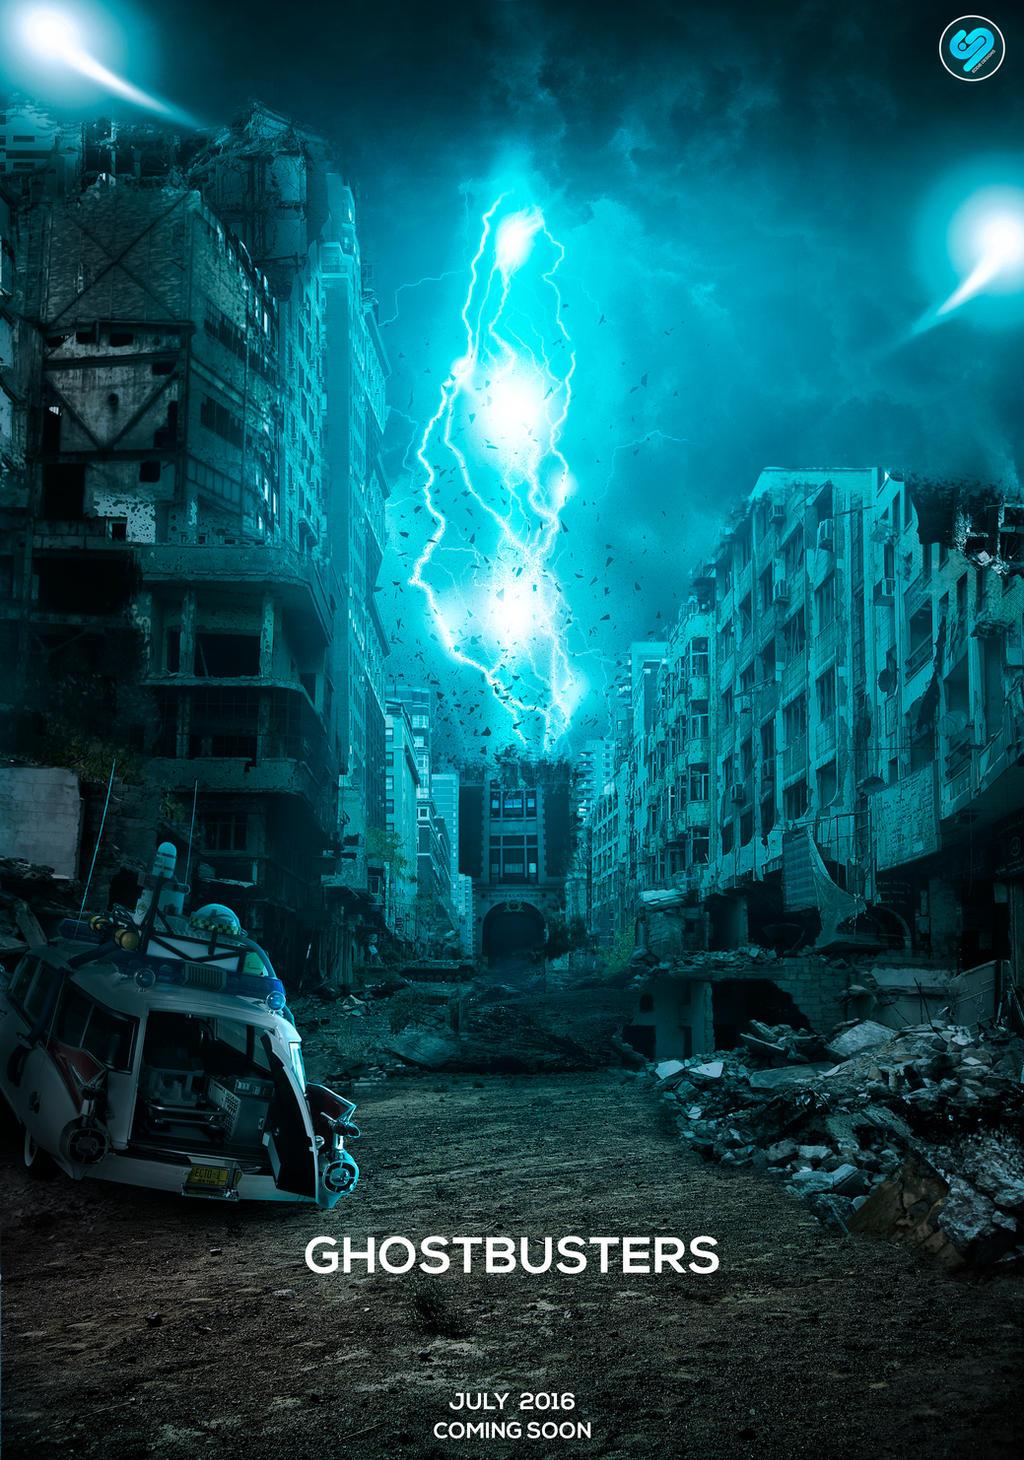 Ghostbusters Poster Design (Tribute) by eddieswan on DeviantArt